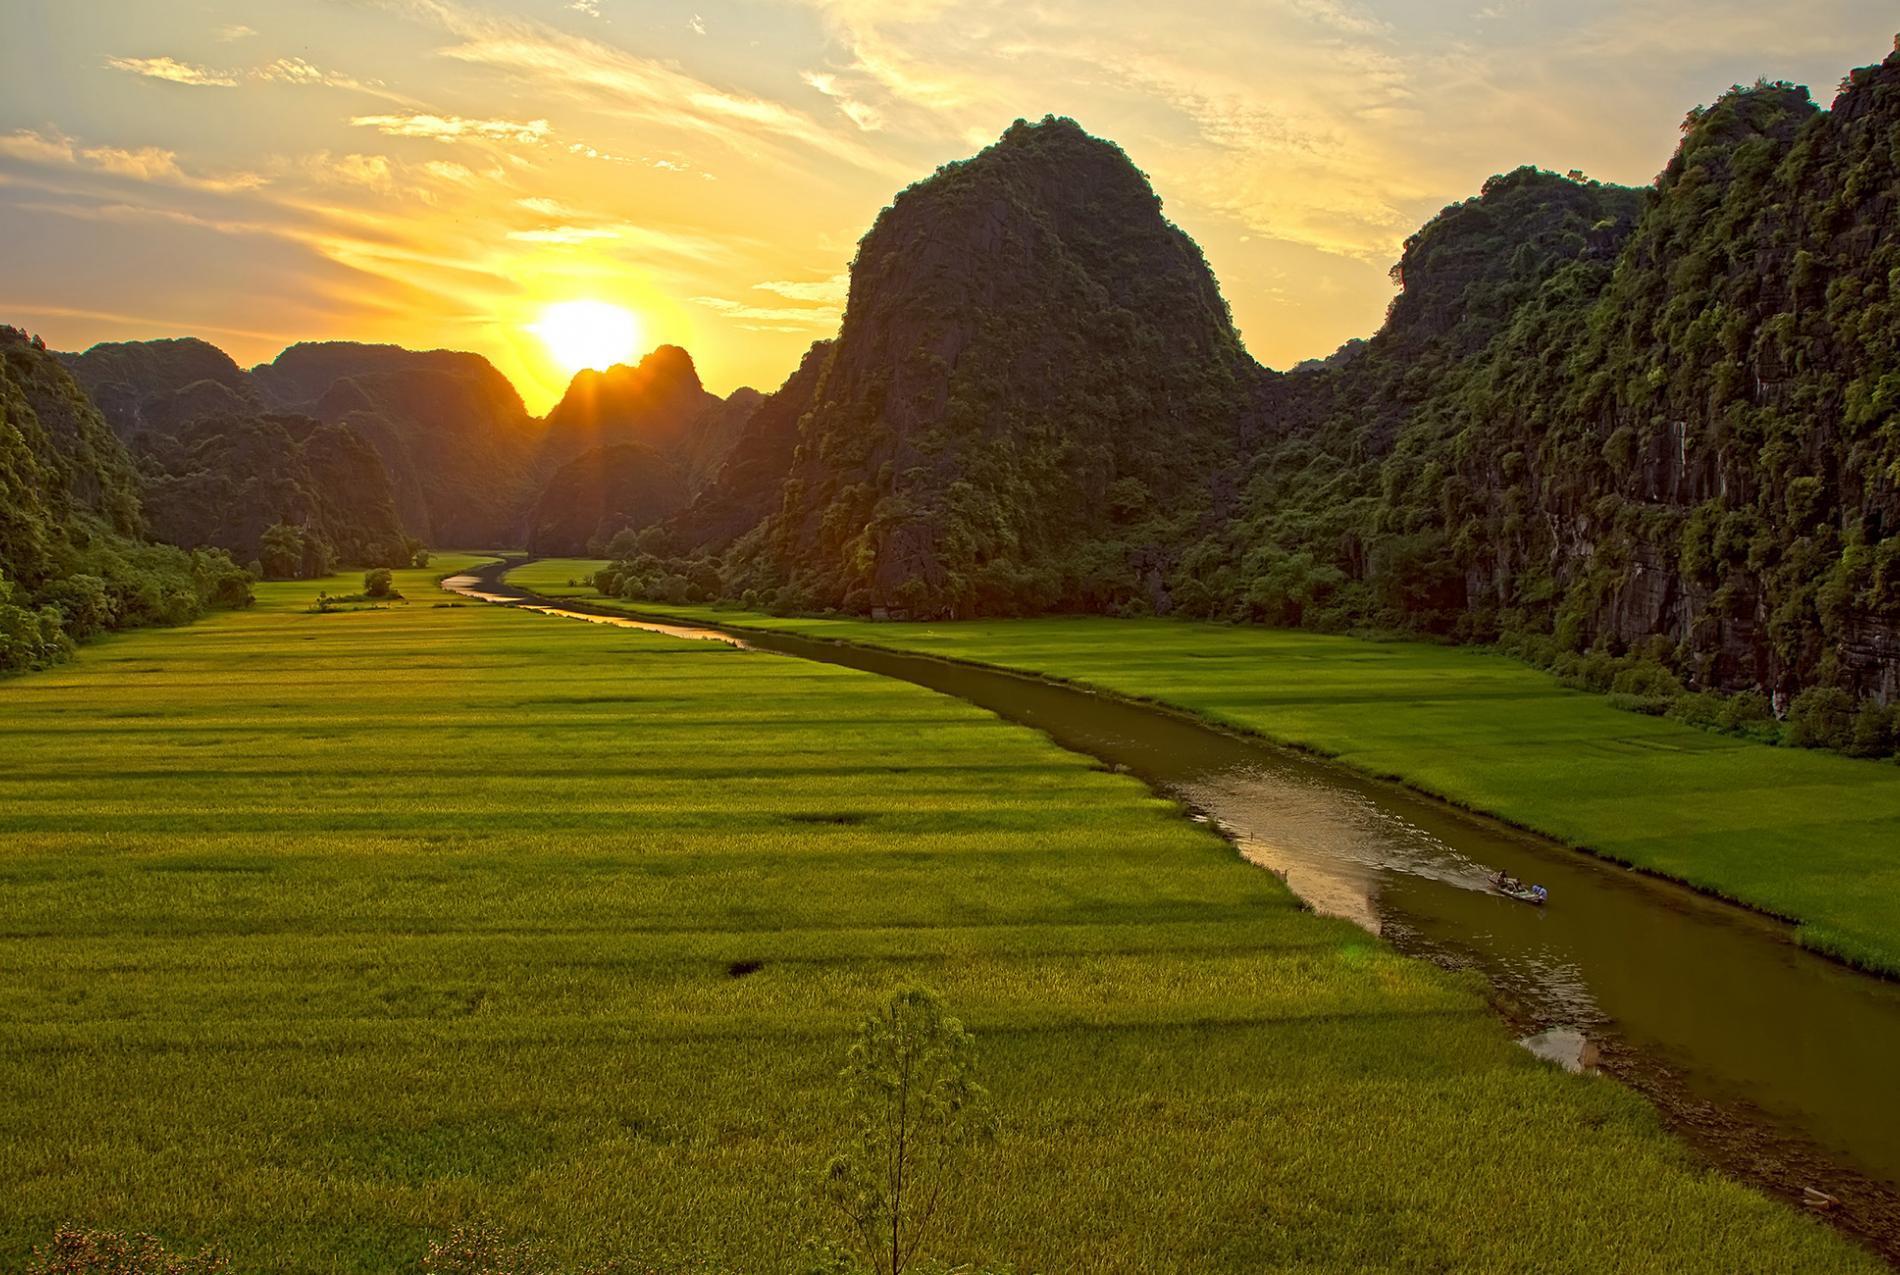 Voyage solidaire Vietnam : Vision du Monde - Photo 11